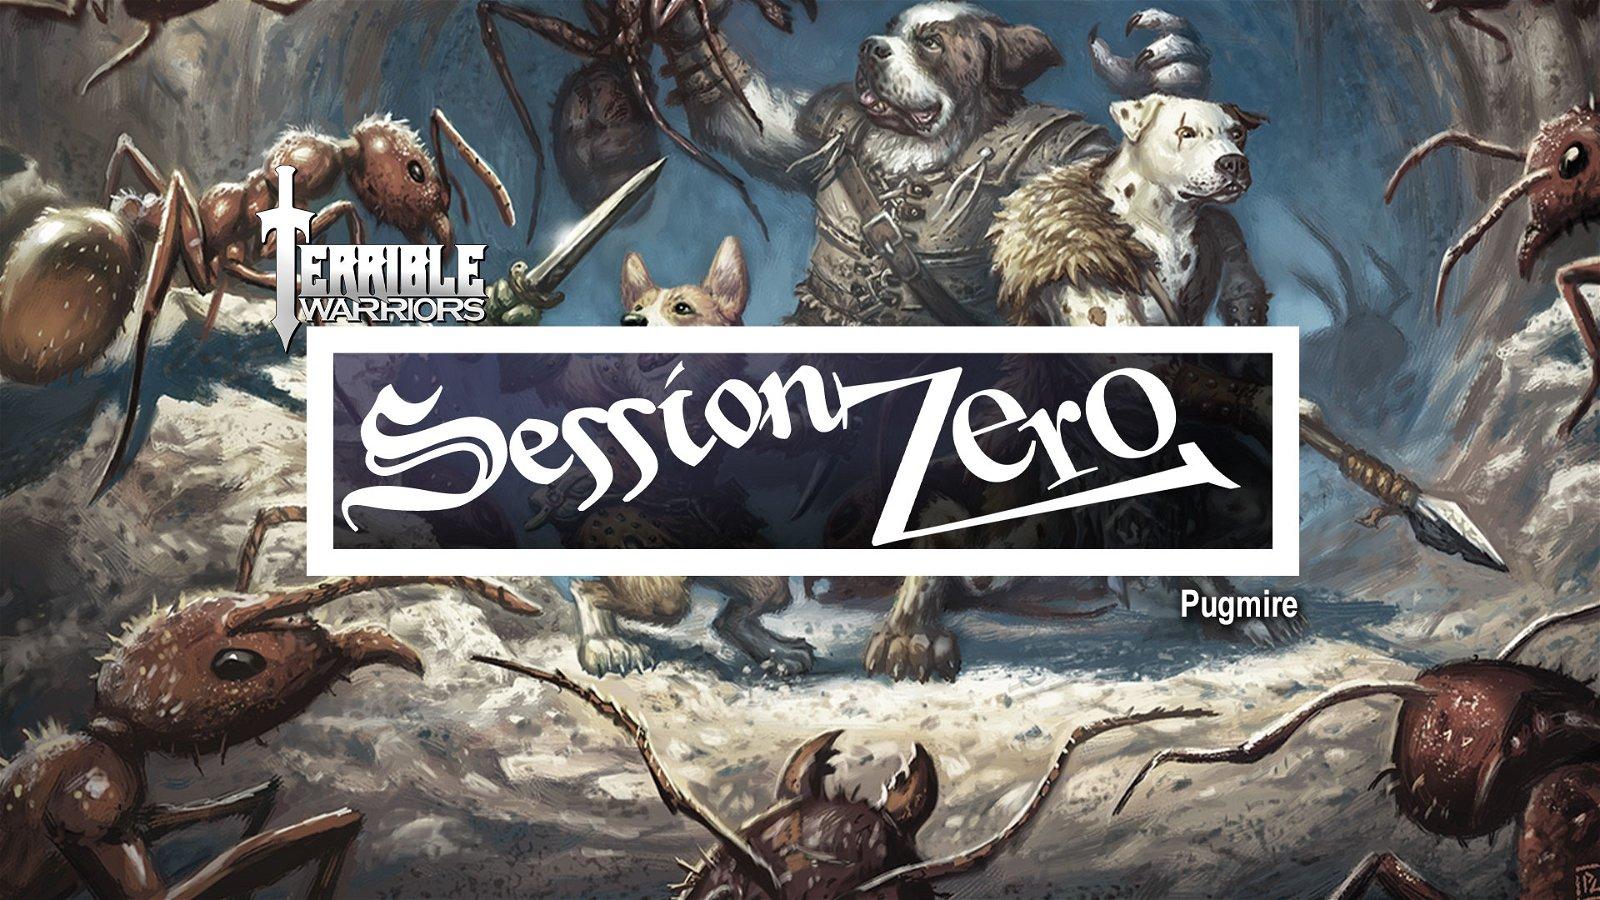 Terrible Warriors - Session Zero: Pugmire